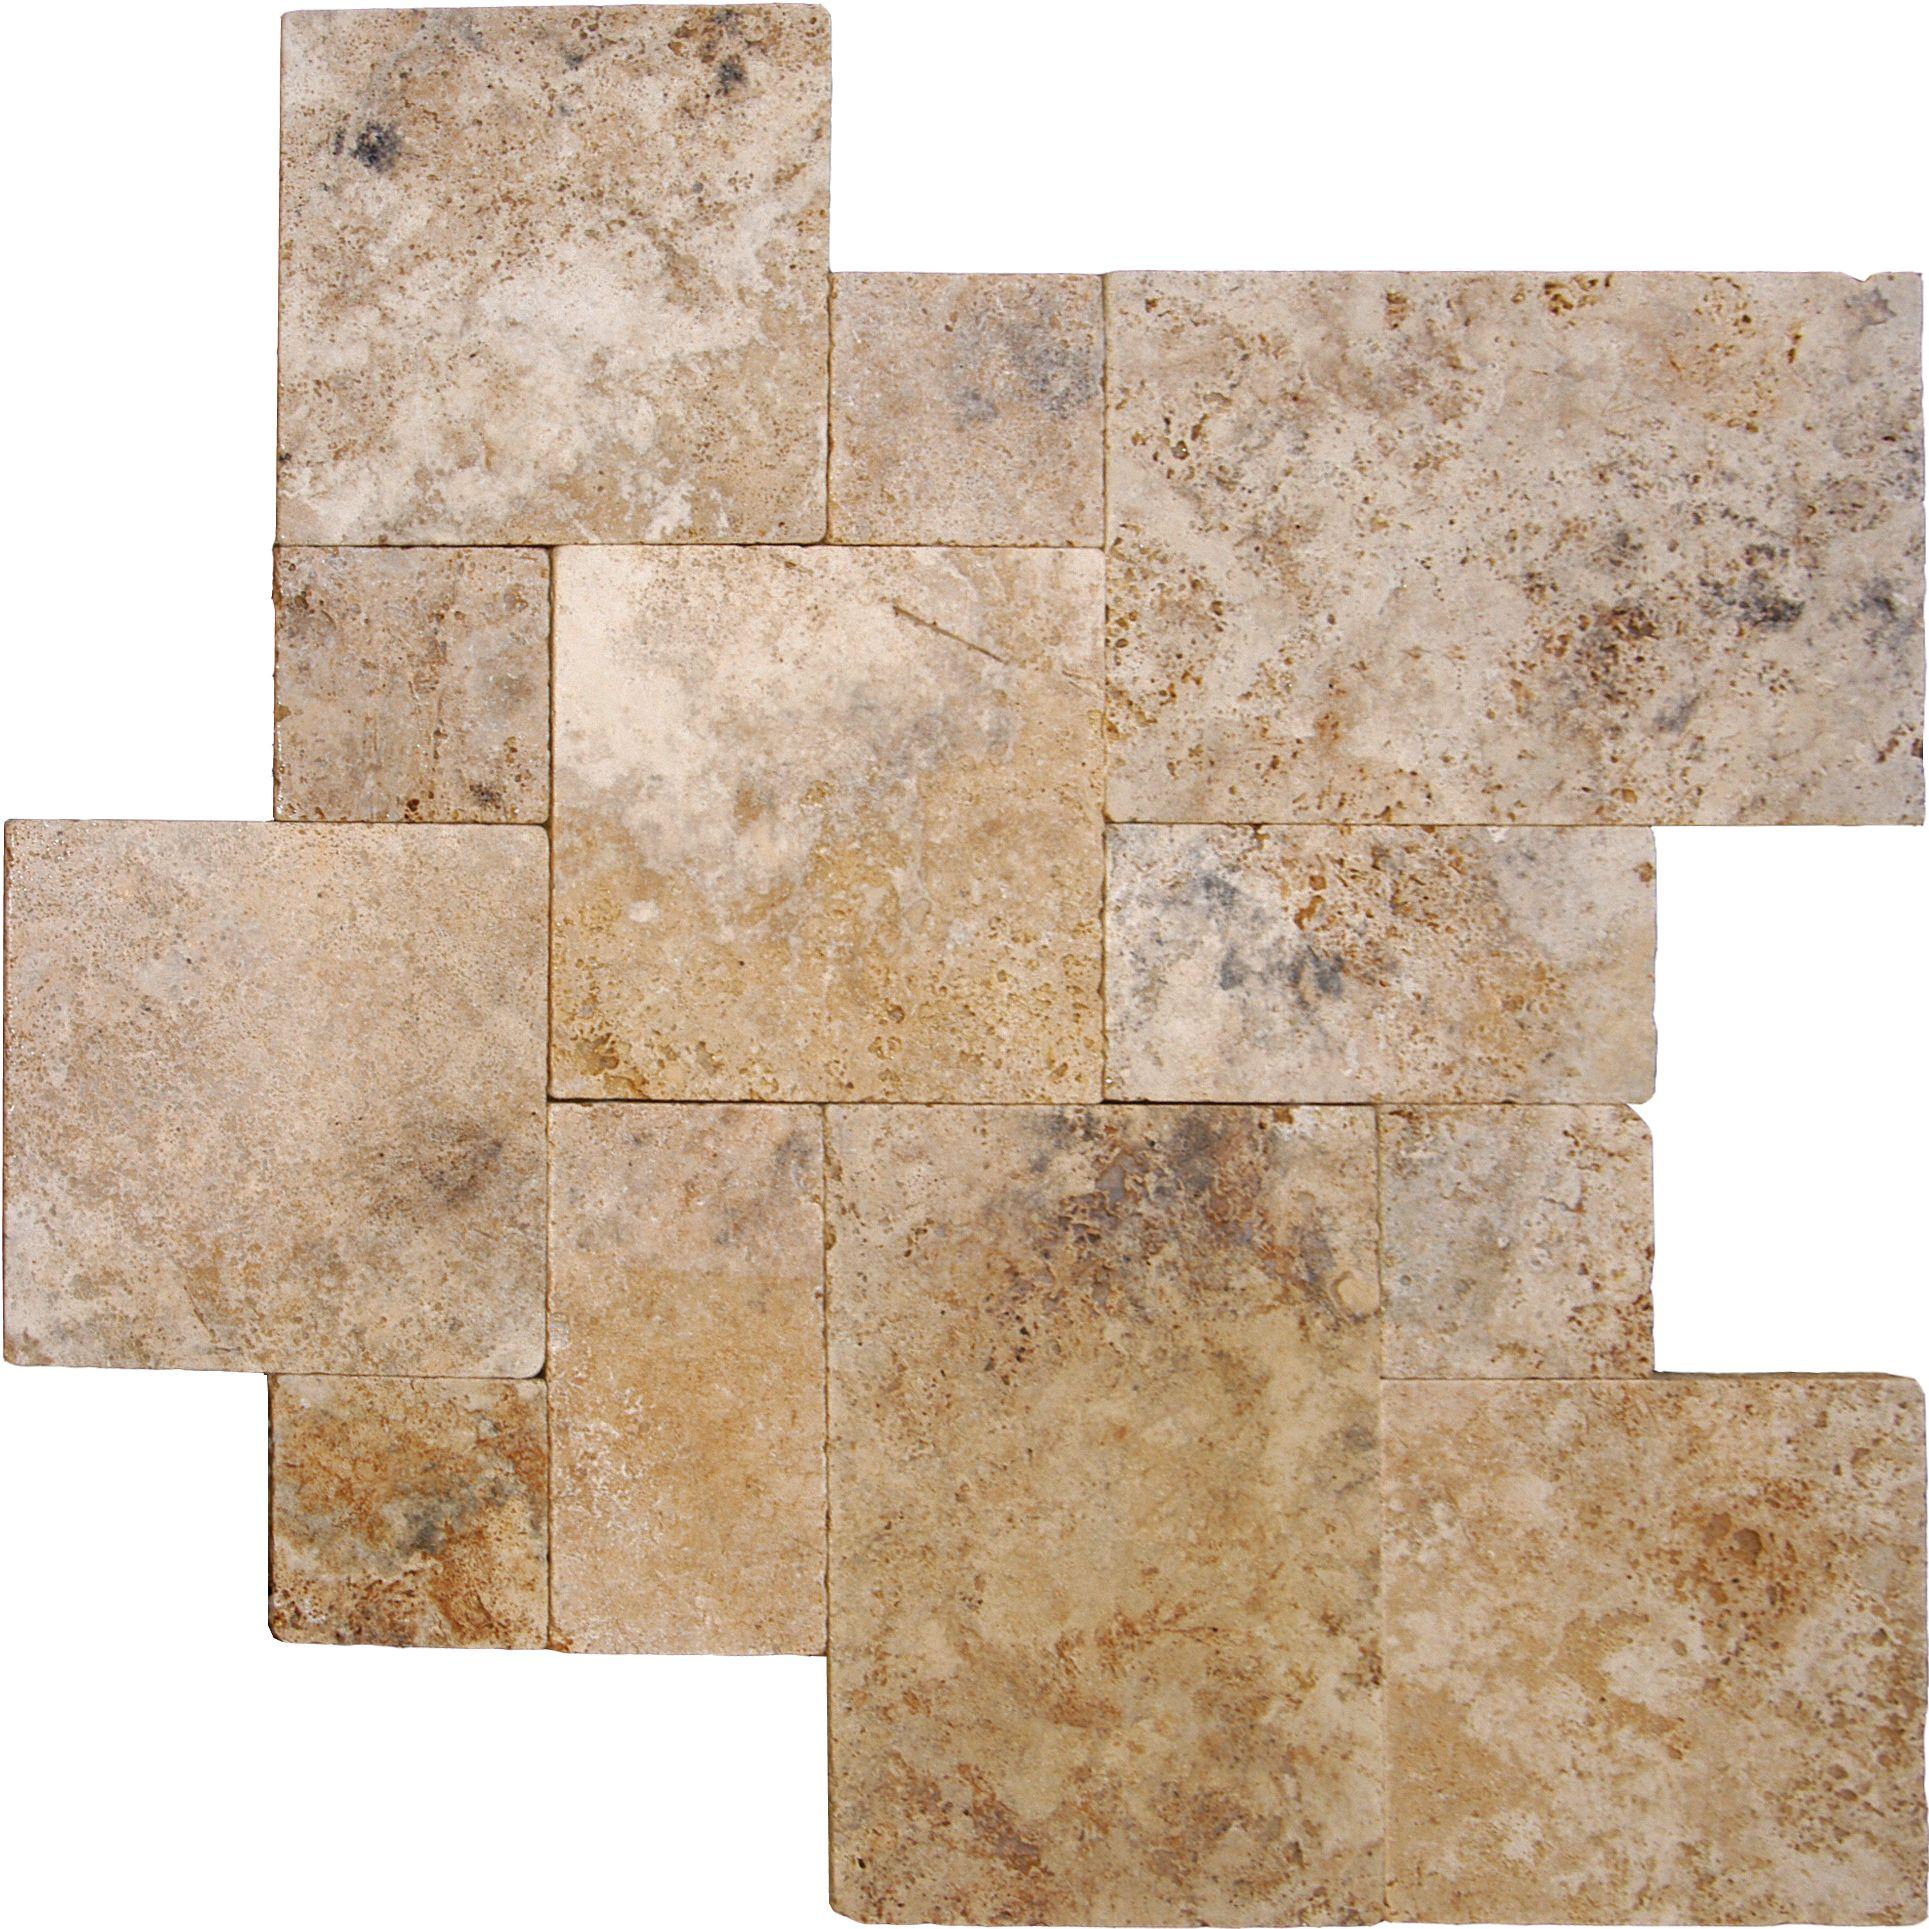 Travertine Tile Patterns glamorous travertine tile patterns flooring photo decoration